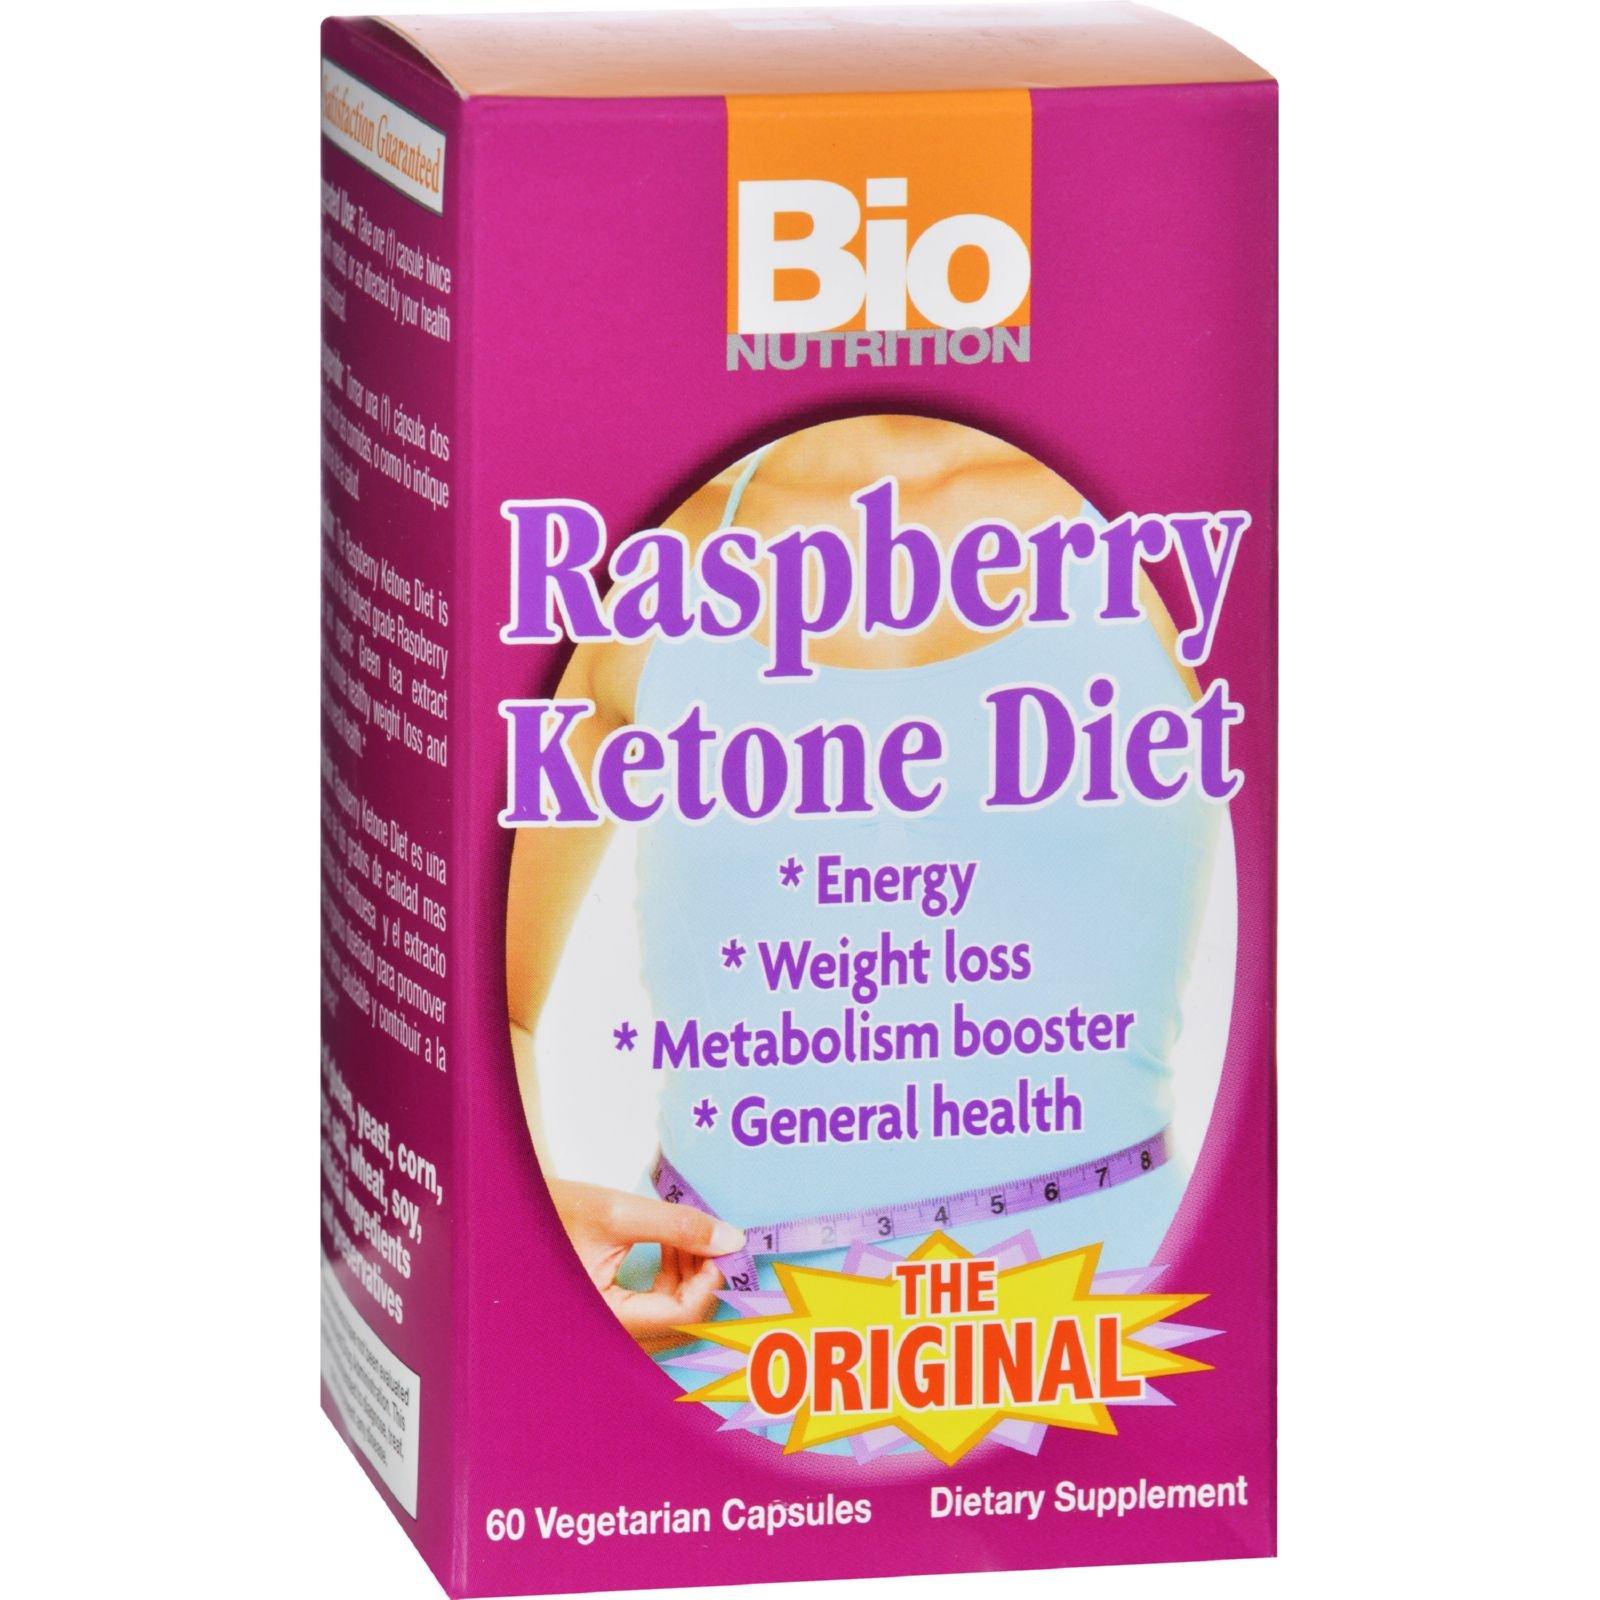 Bio Nutrition Raspberry Ketone Diet - 60 Veggie Capsules (Pack of 2)